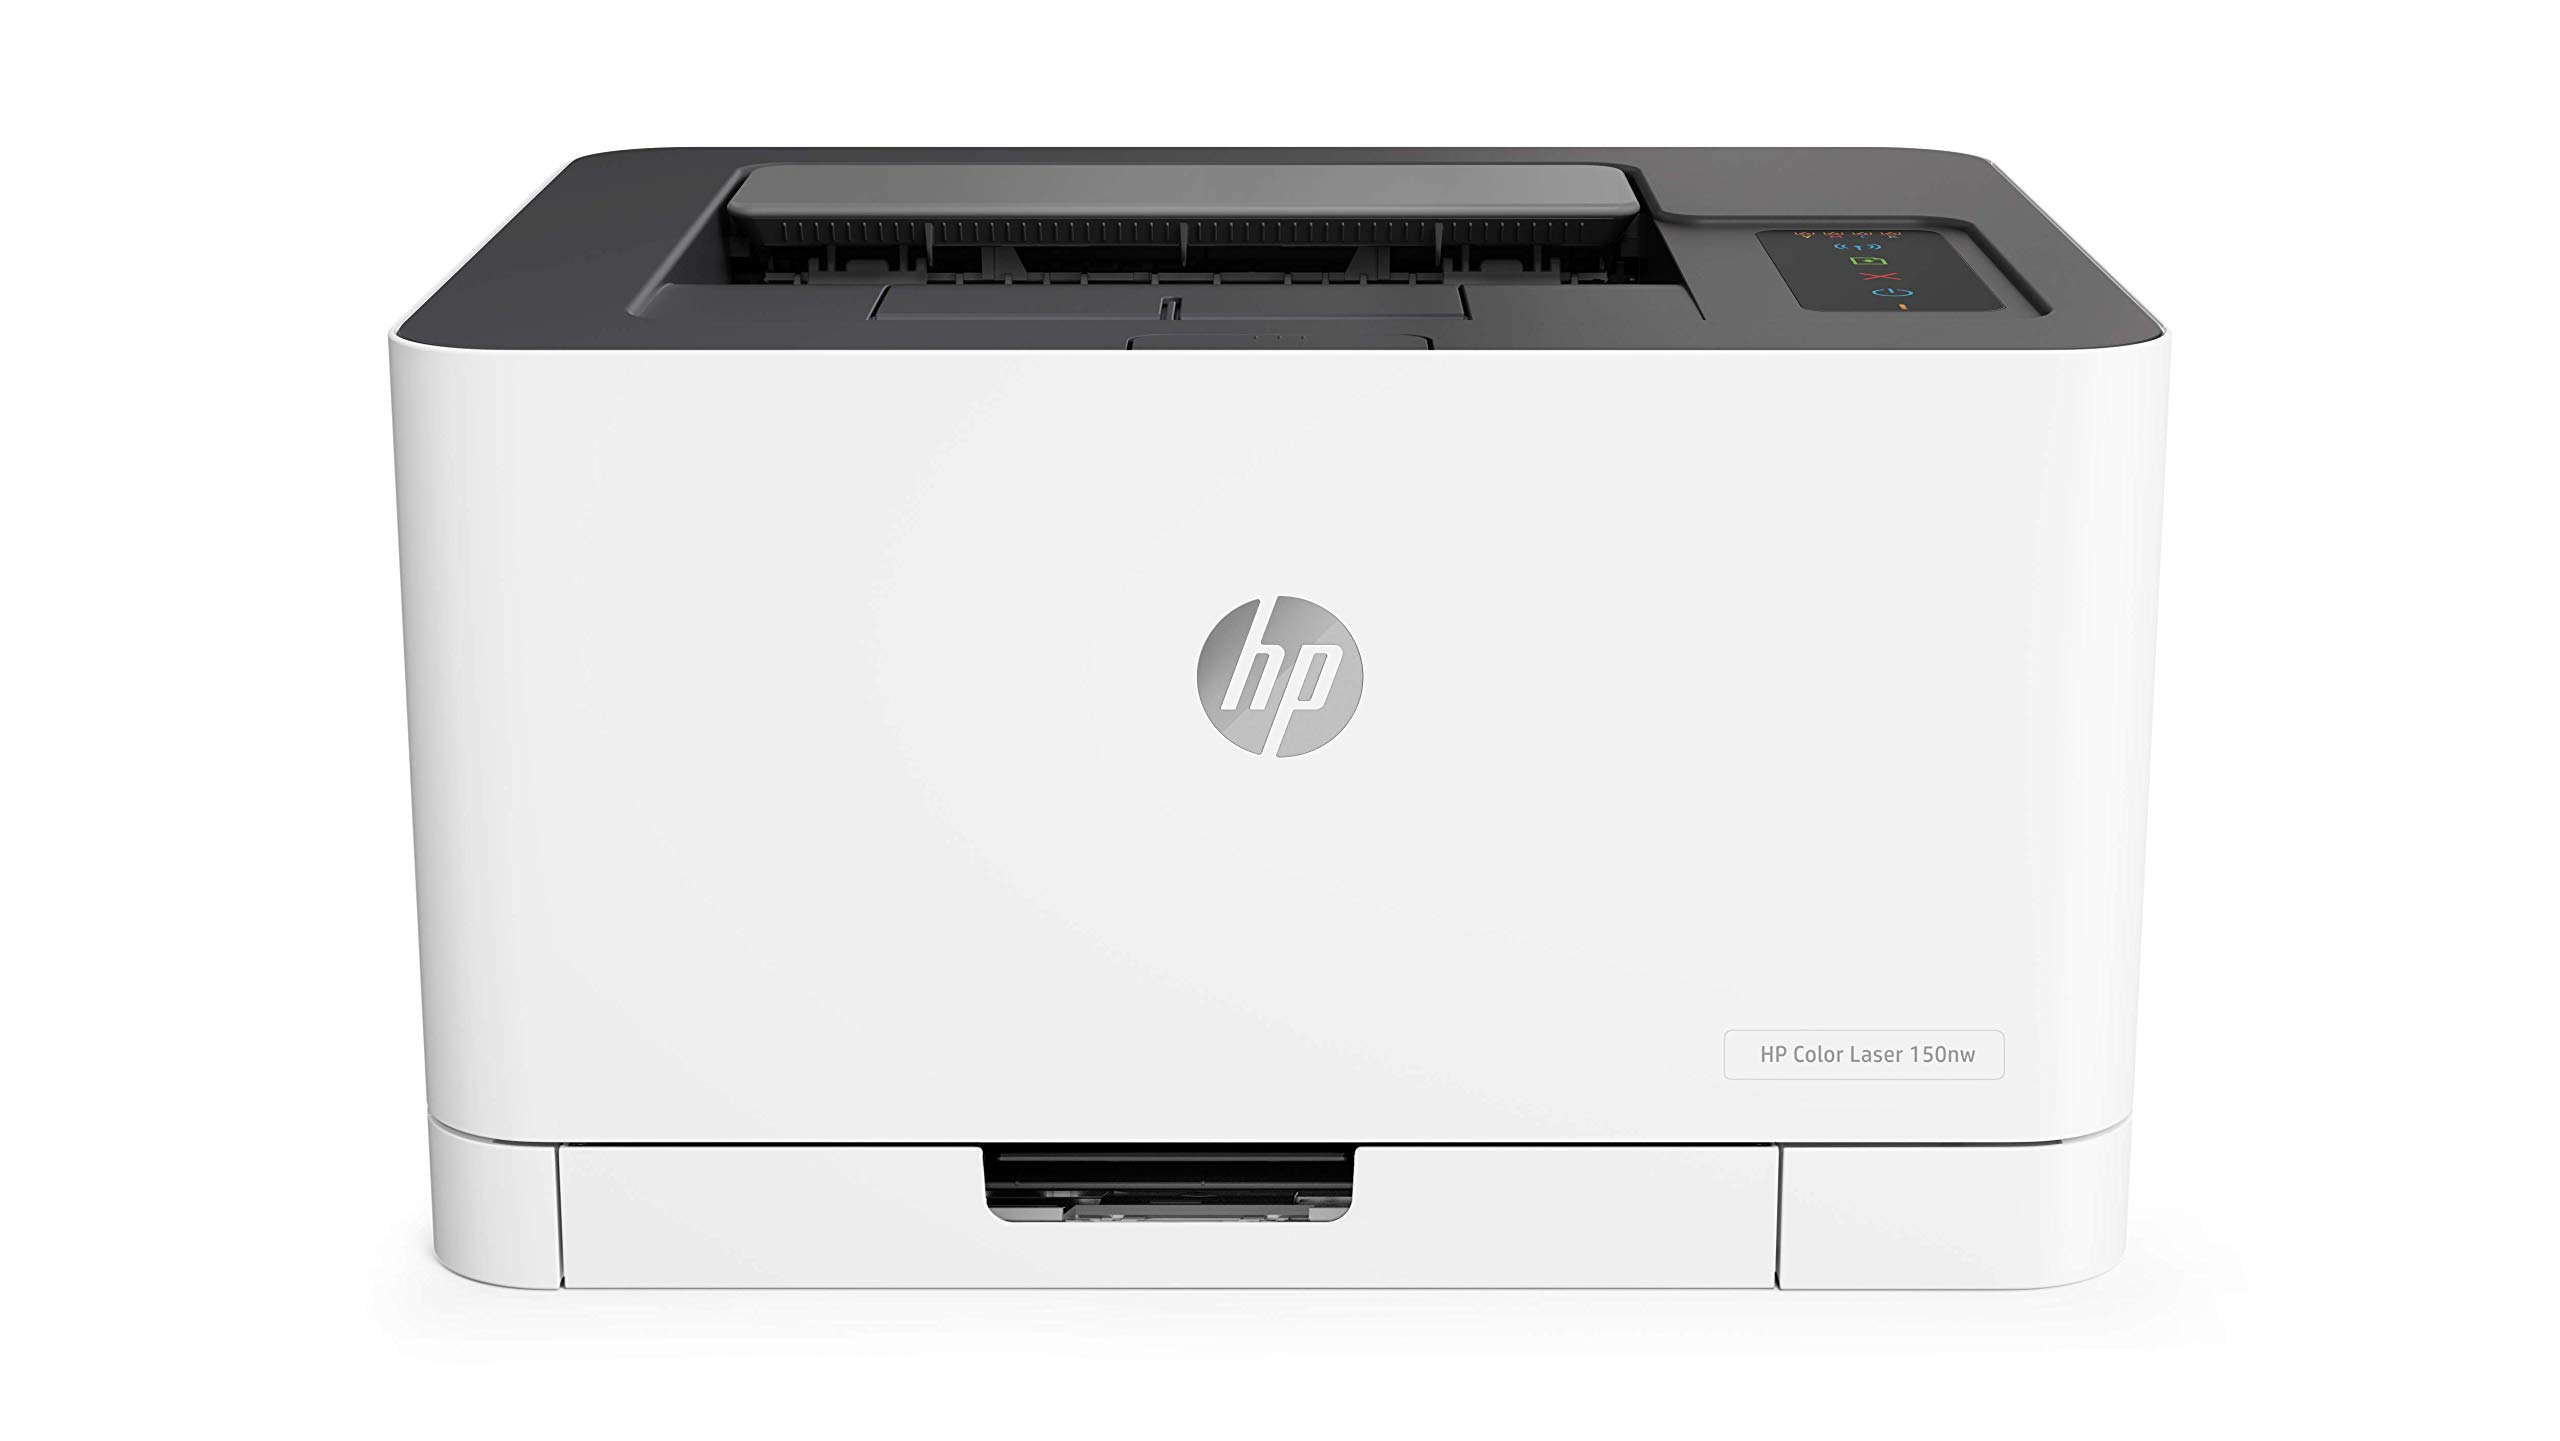 HP Colour Laser 150nw Wireless Printer, White